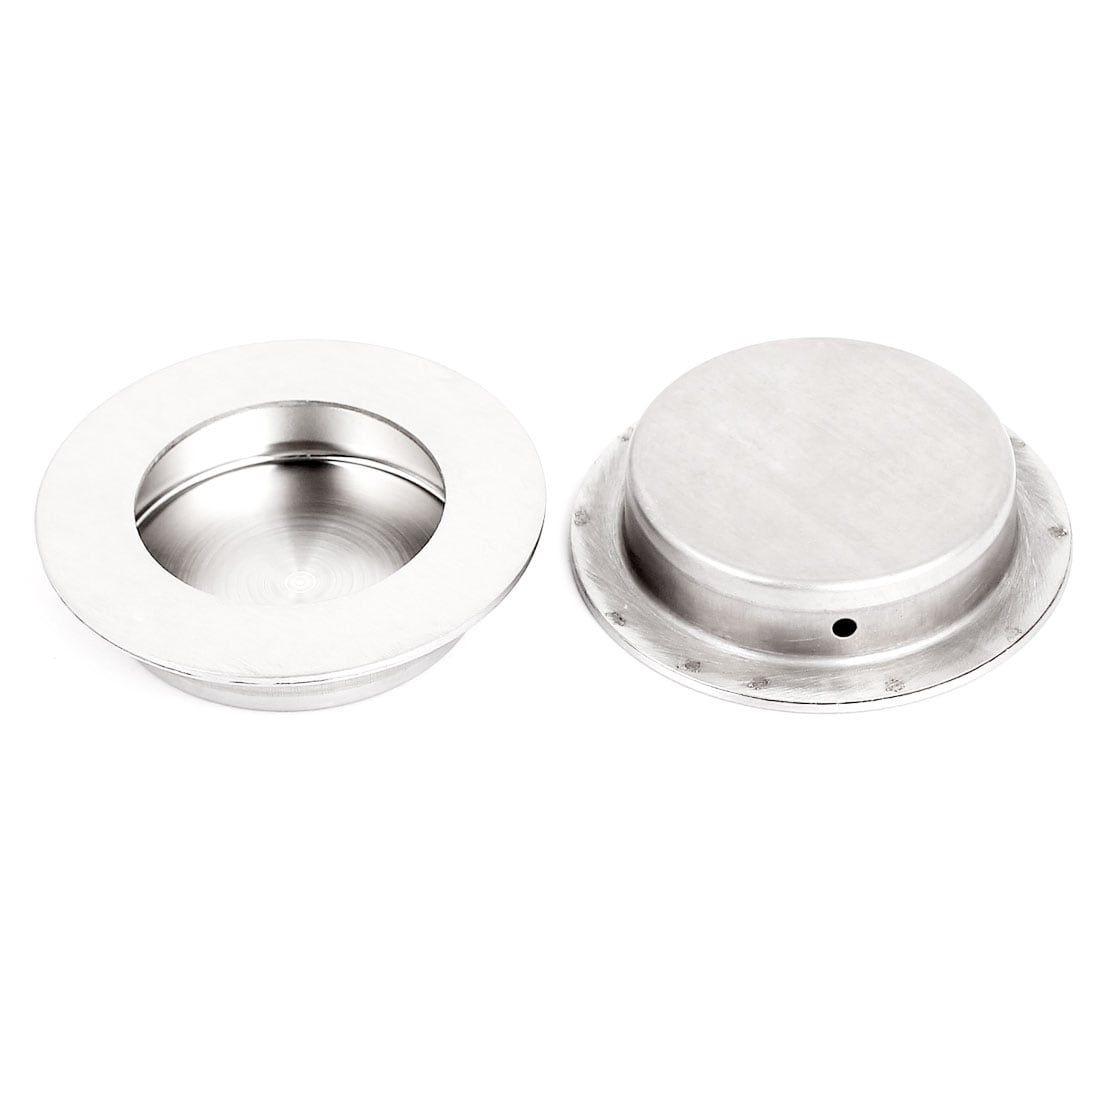 Sliding Door Drawer Stainless Steel 65mm Round Recessed Flush Pull Handle 2pcs Sliding Doors Sliding Door Handles Stainless Steel Material